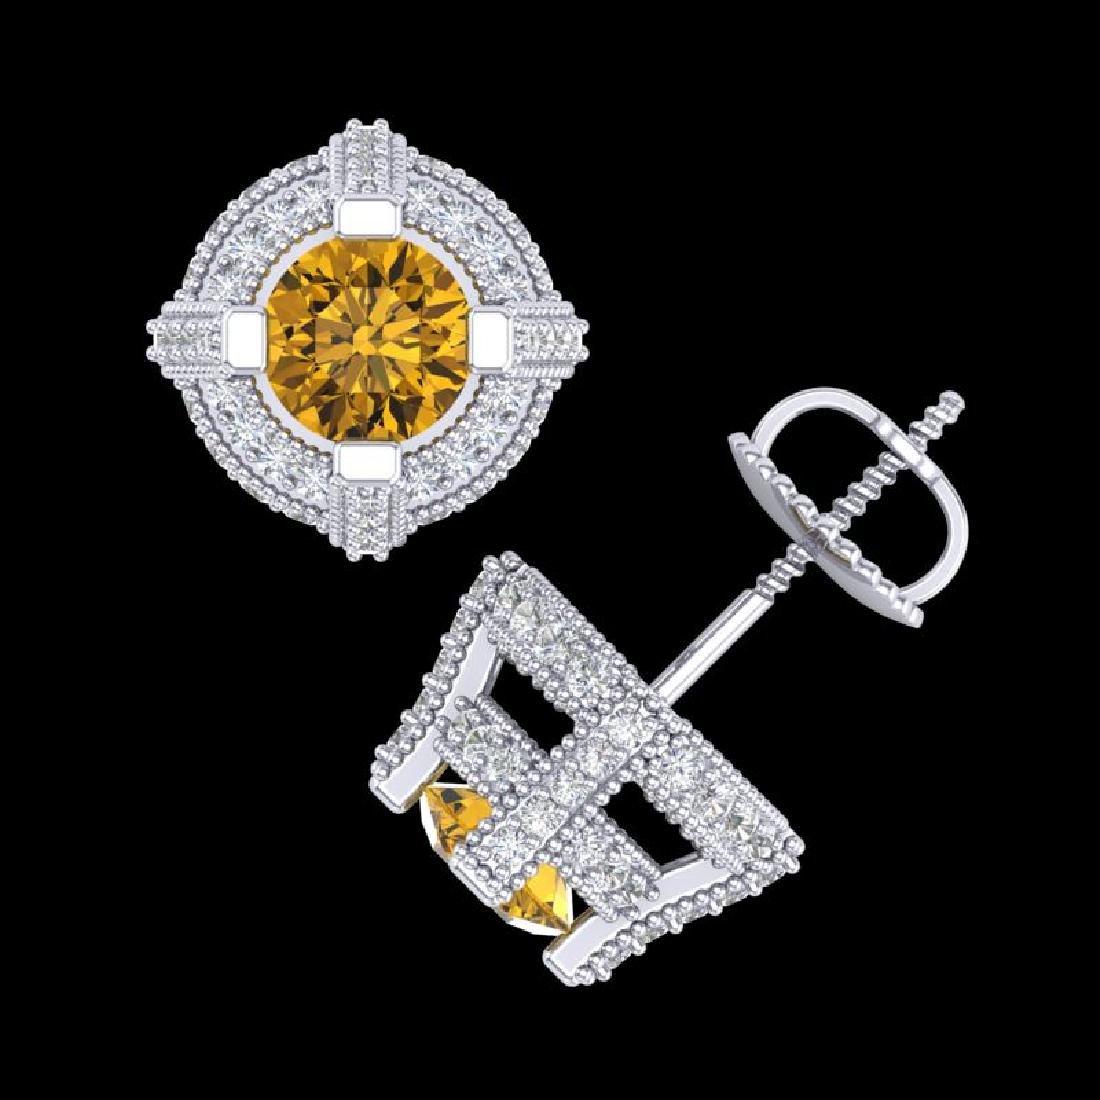 2.75 CTW Intense Fancy Yellow Diamond Micro Pave Stud - 3